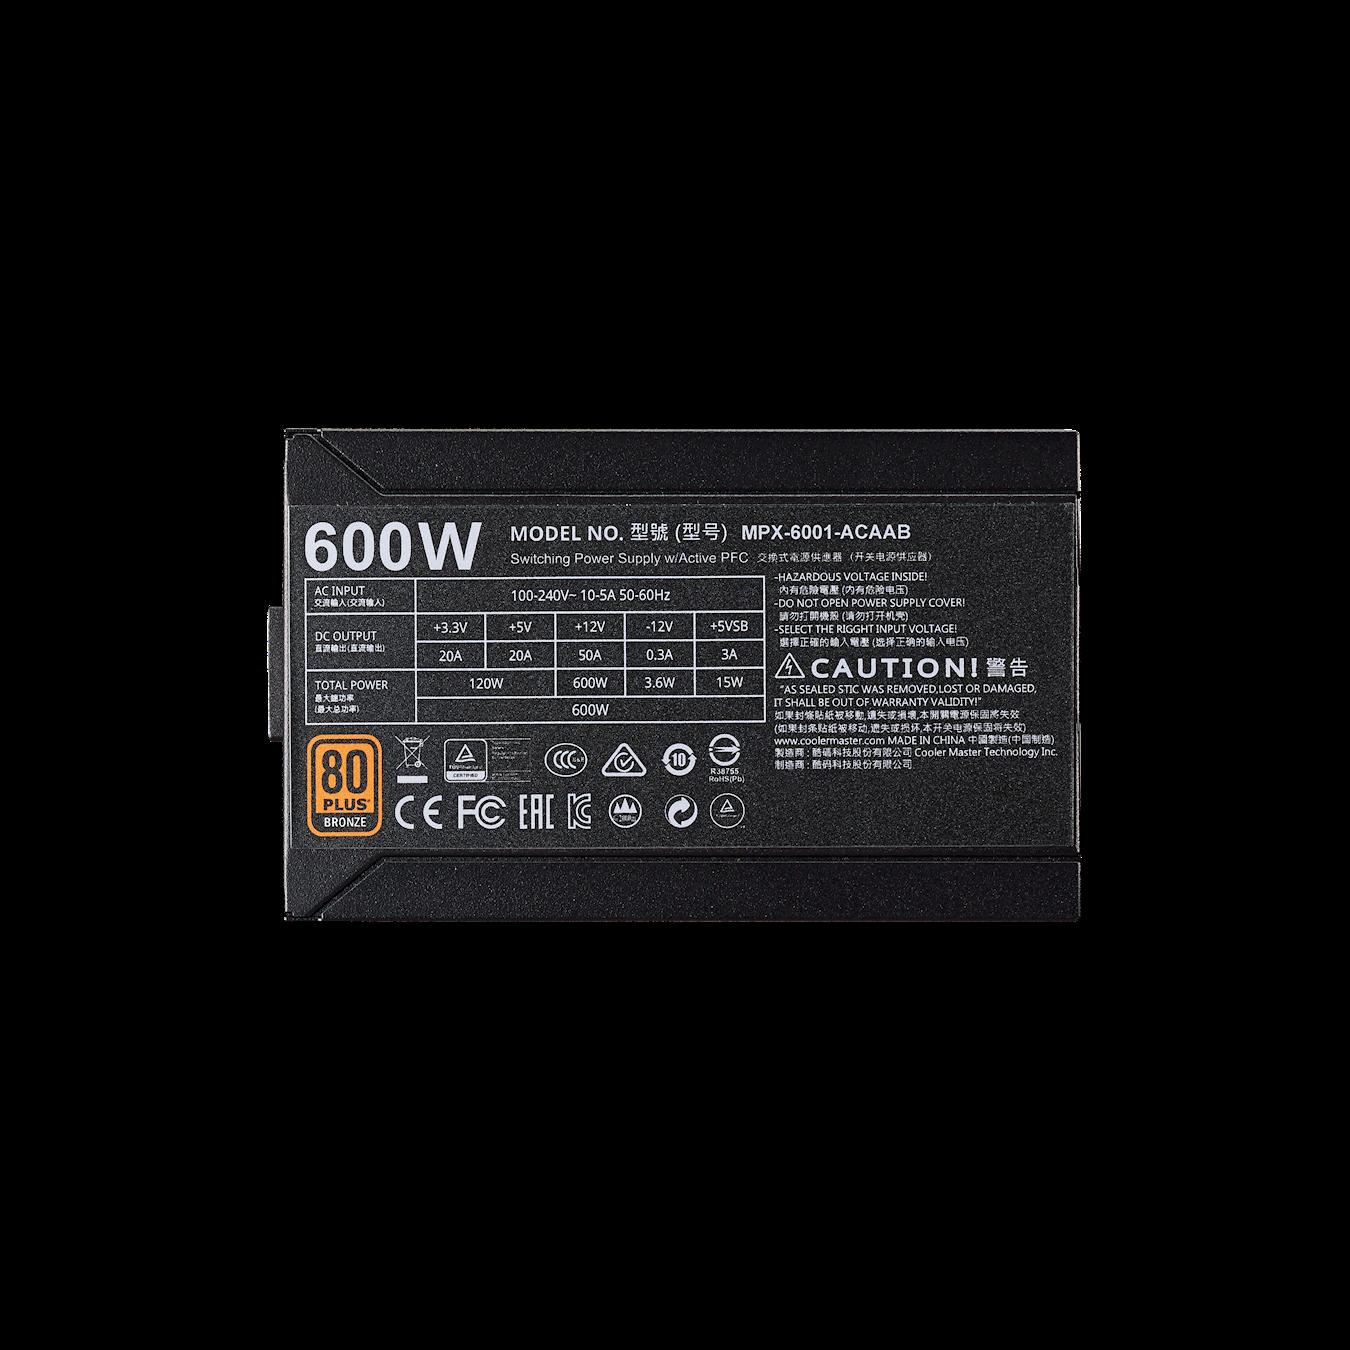 FUENTE REAL 600W 80PLUS BRONZE - COOLER MASTER